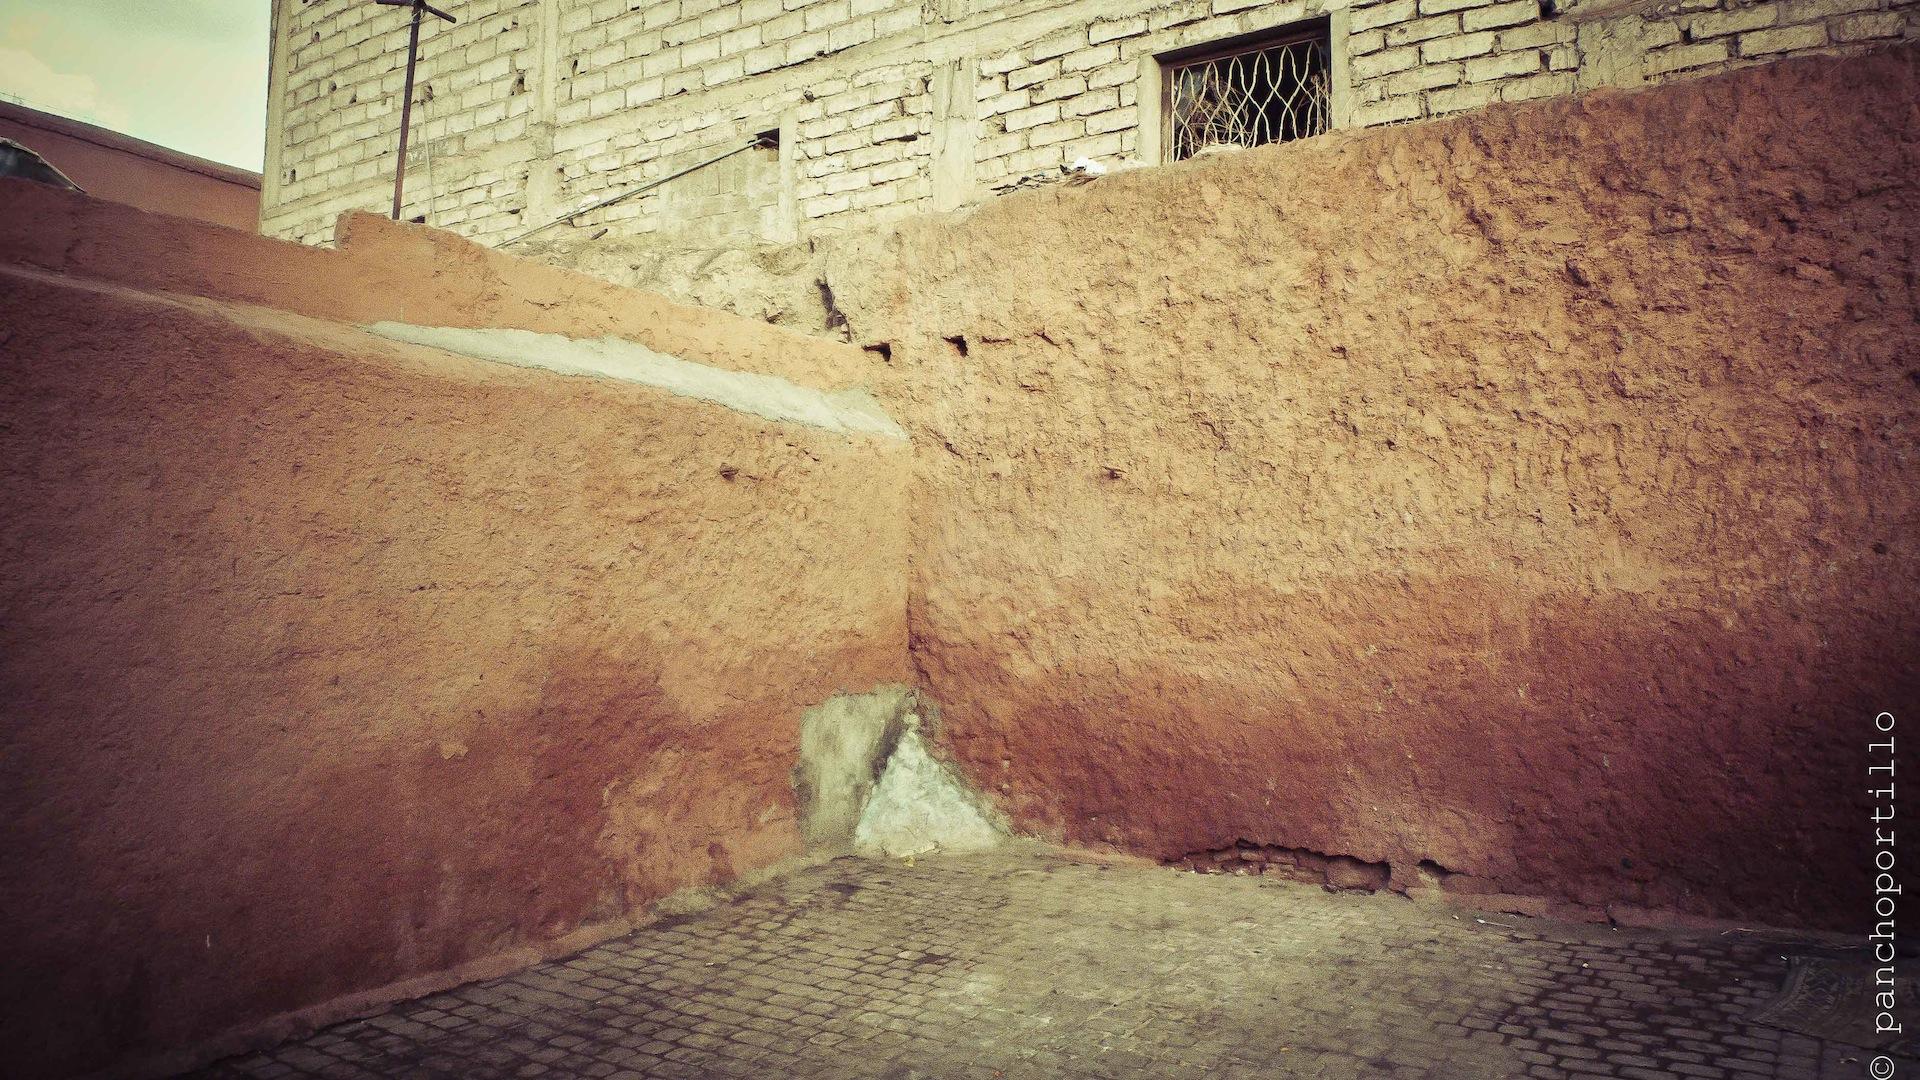 Marrakesh-11-L1060584